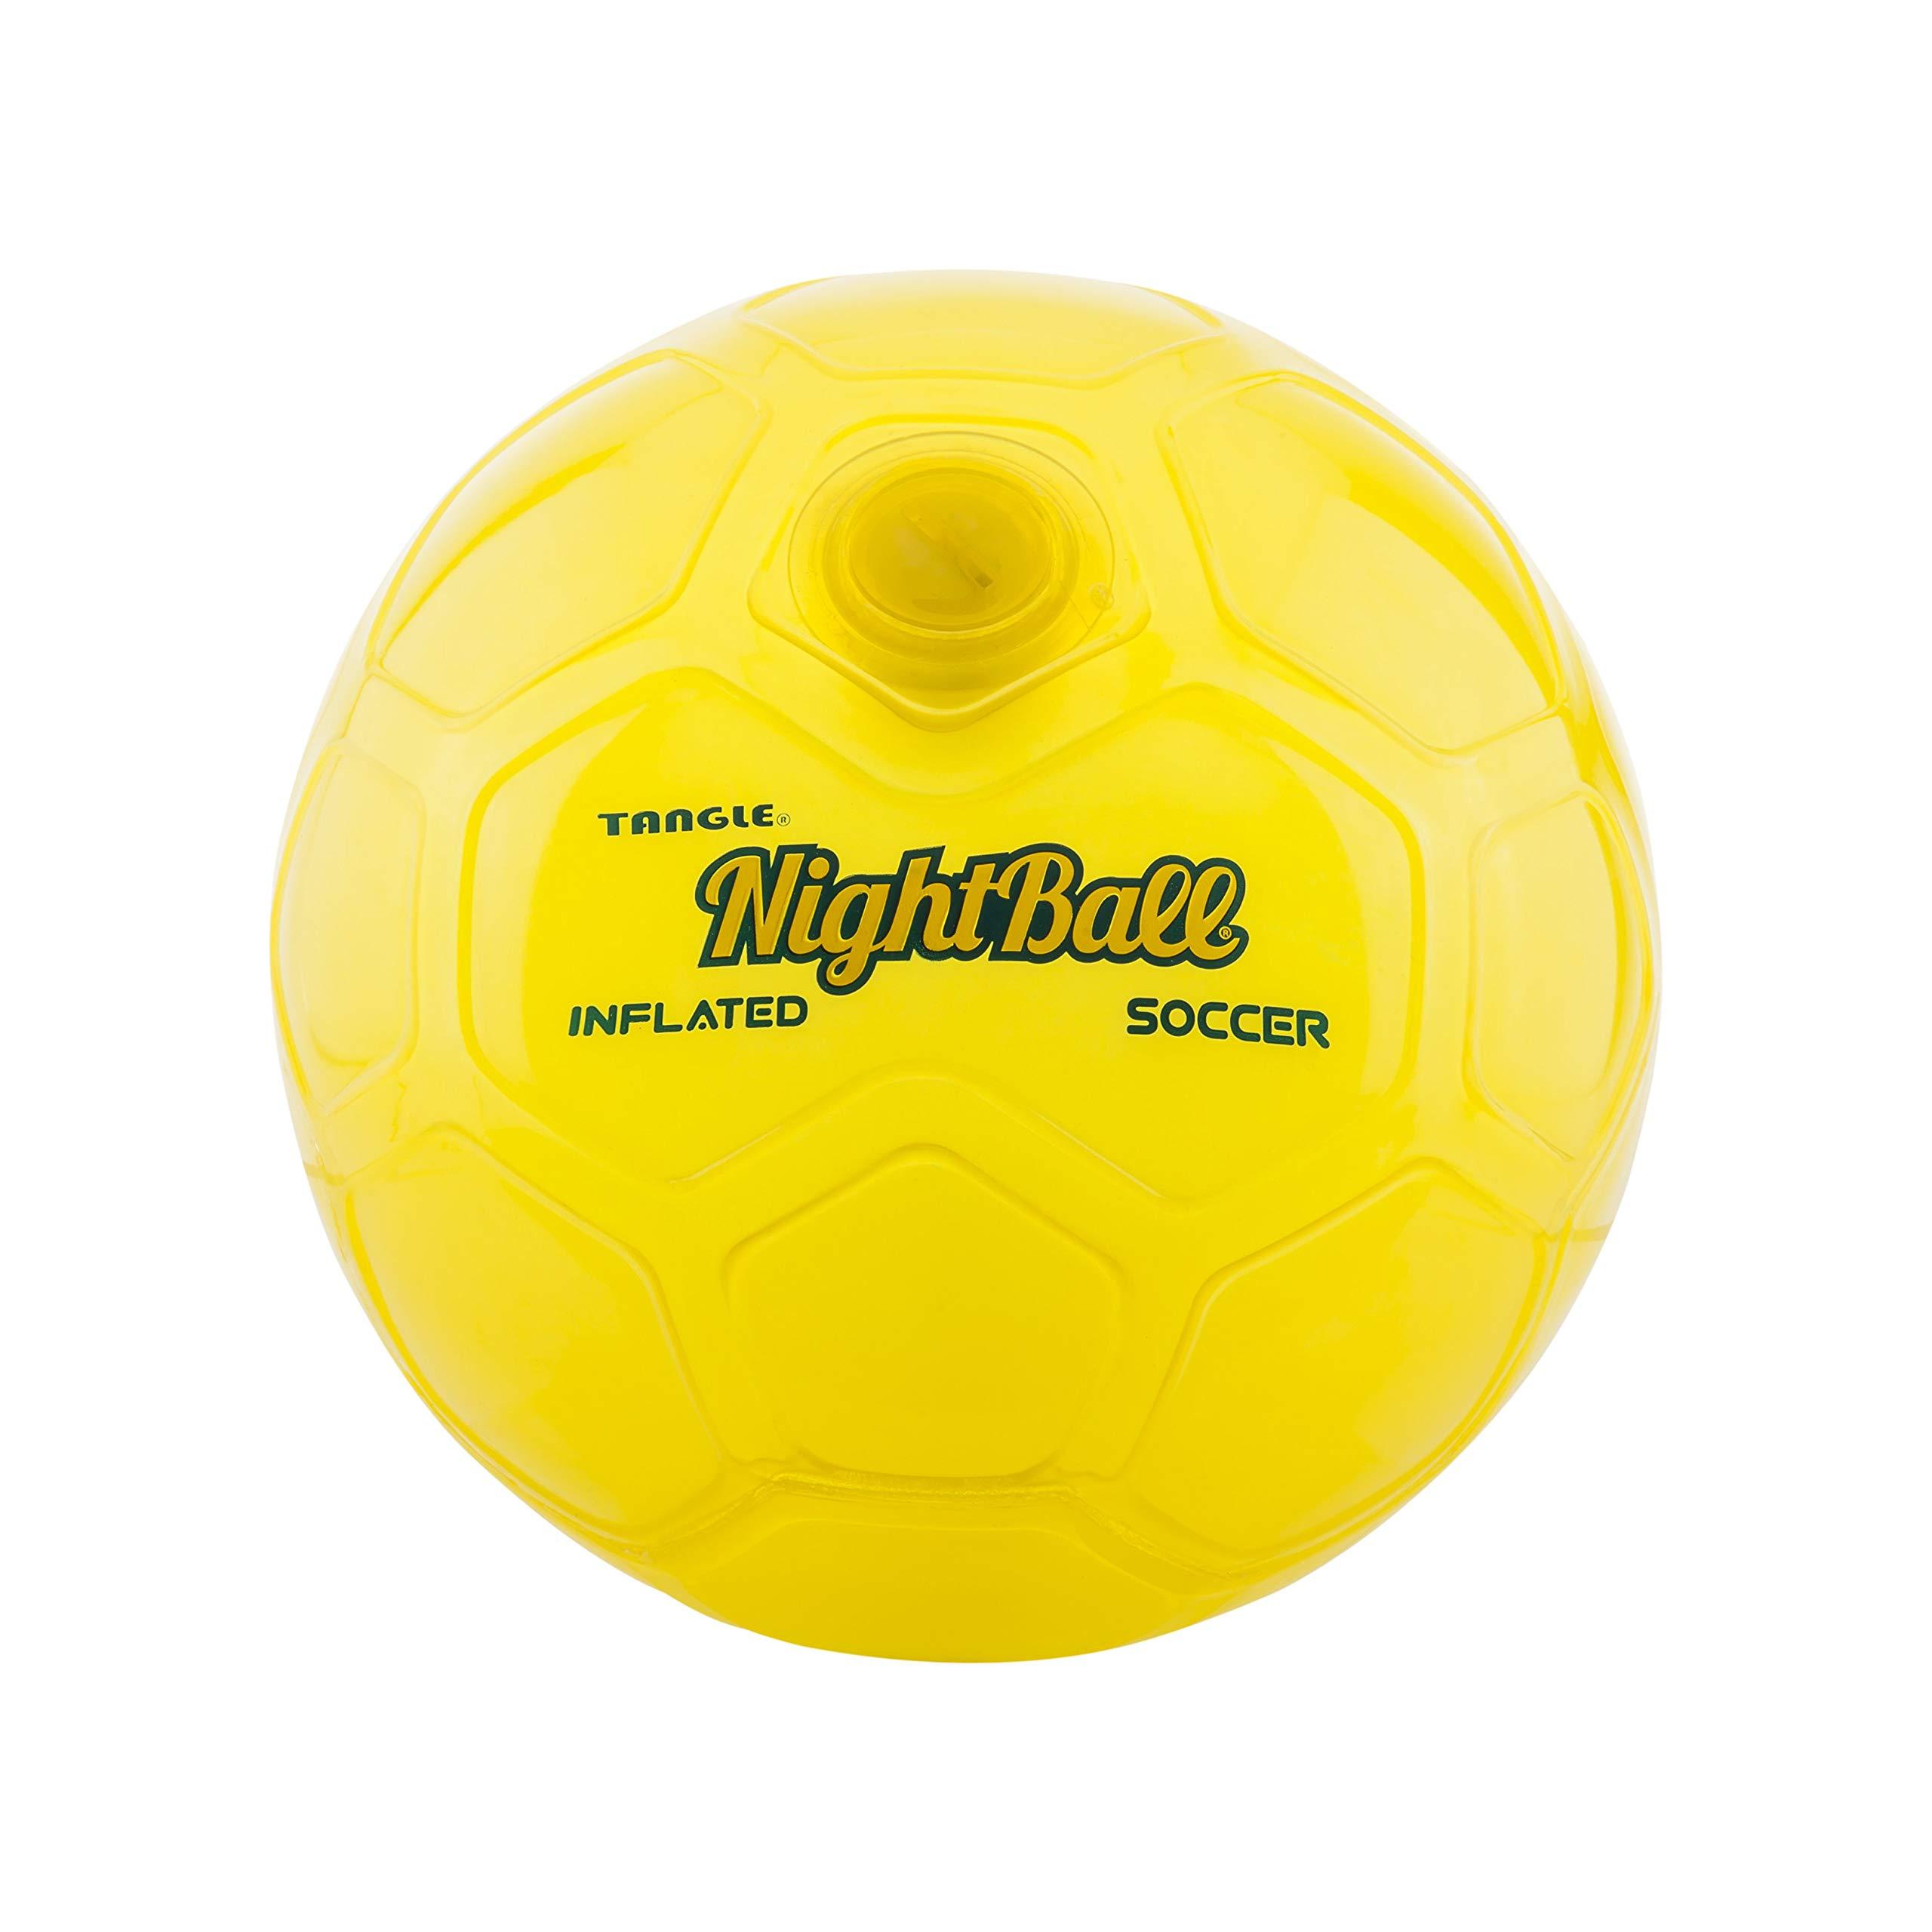 Nightball Tangle LED Light Up Soccer Ball Yellow by Nightball